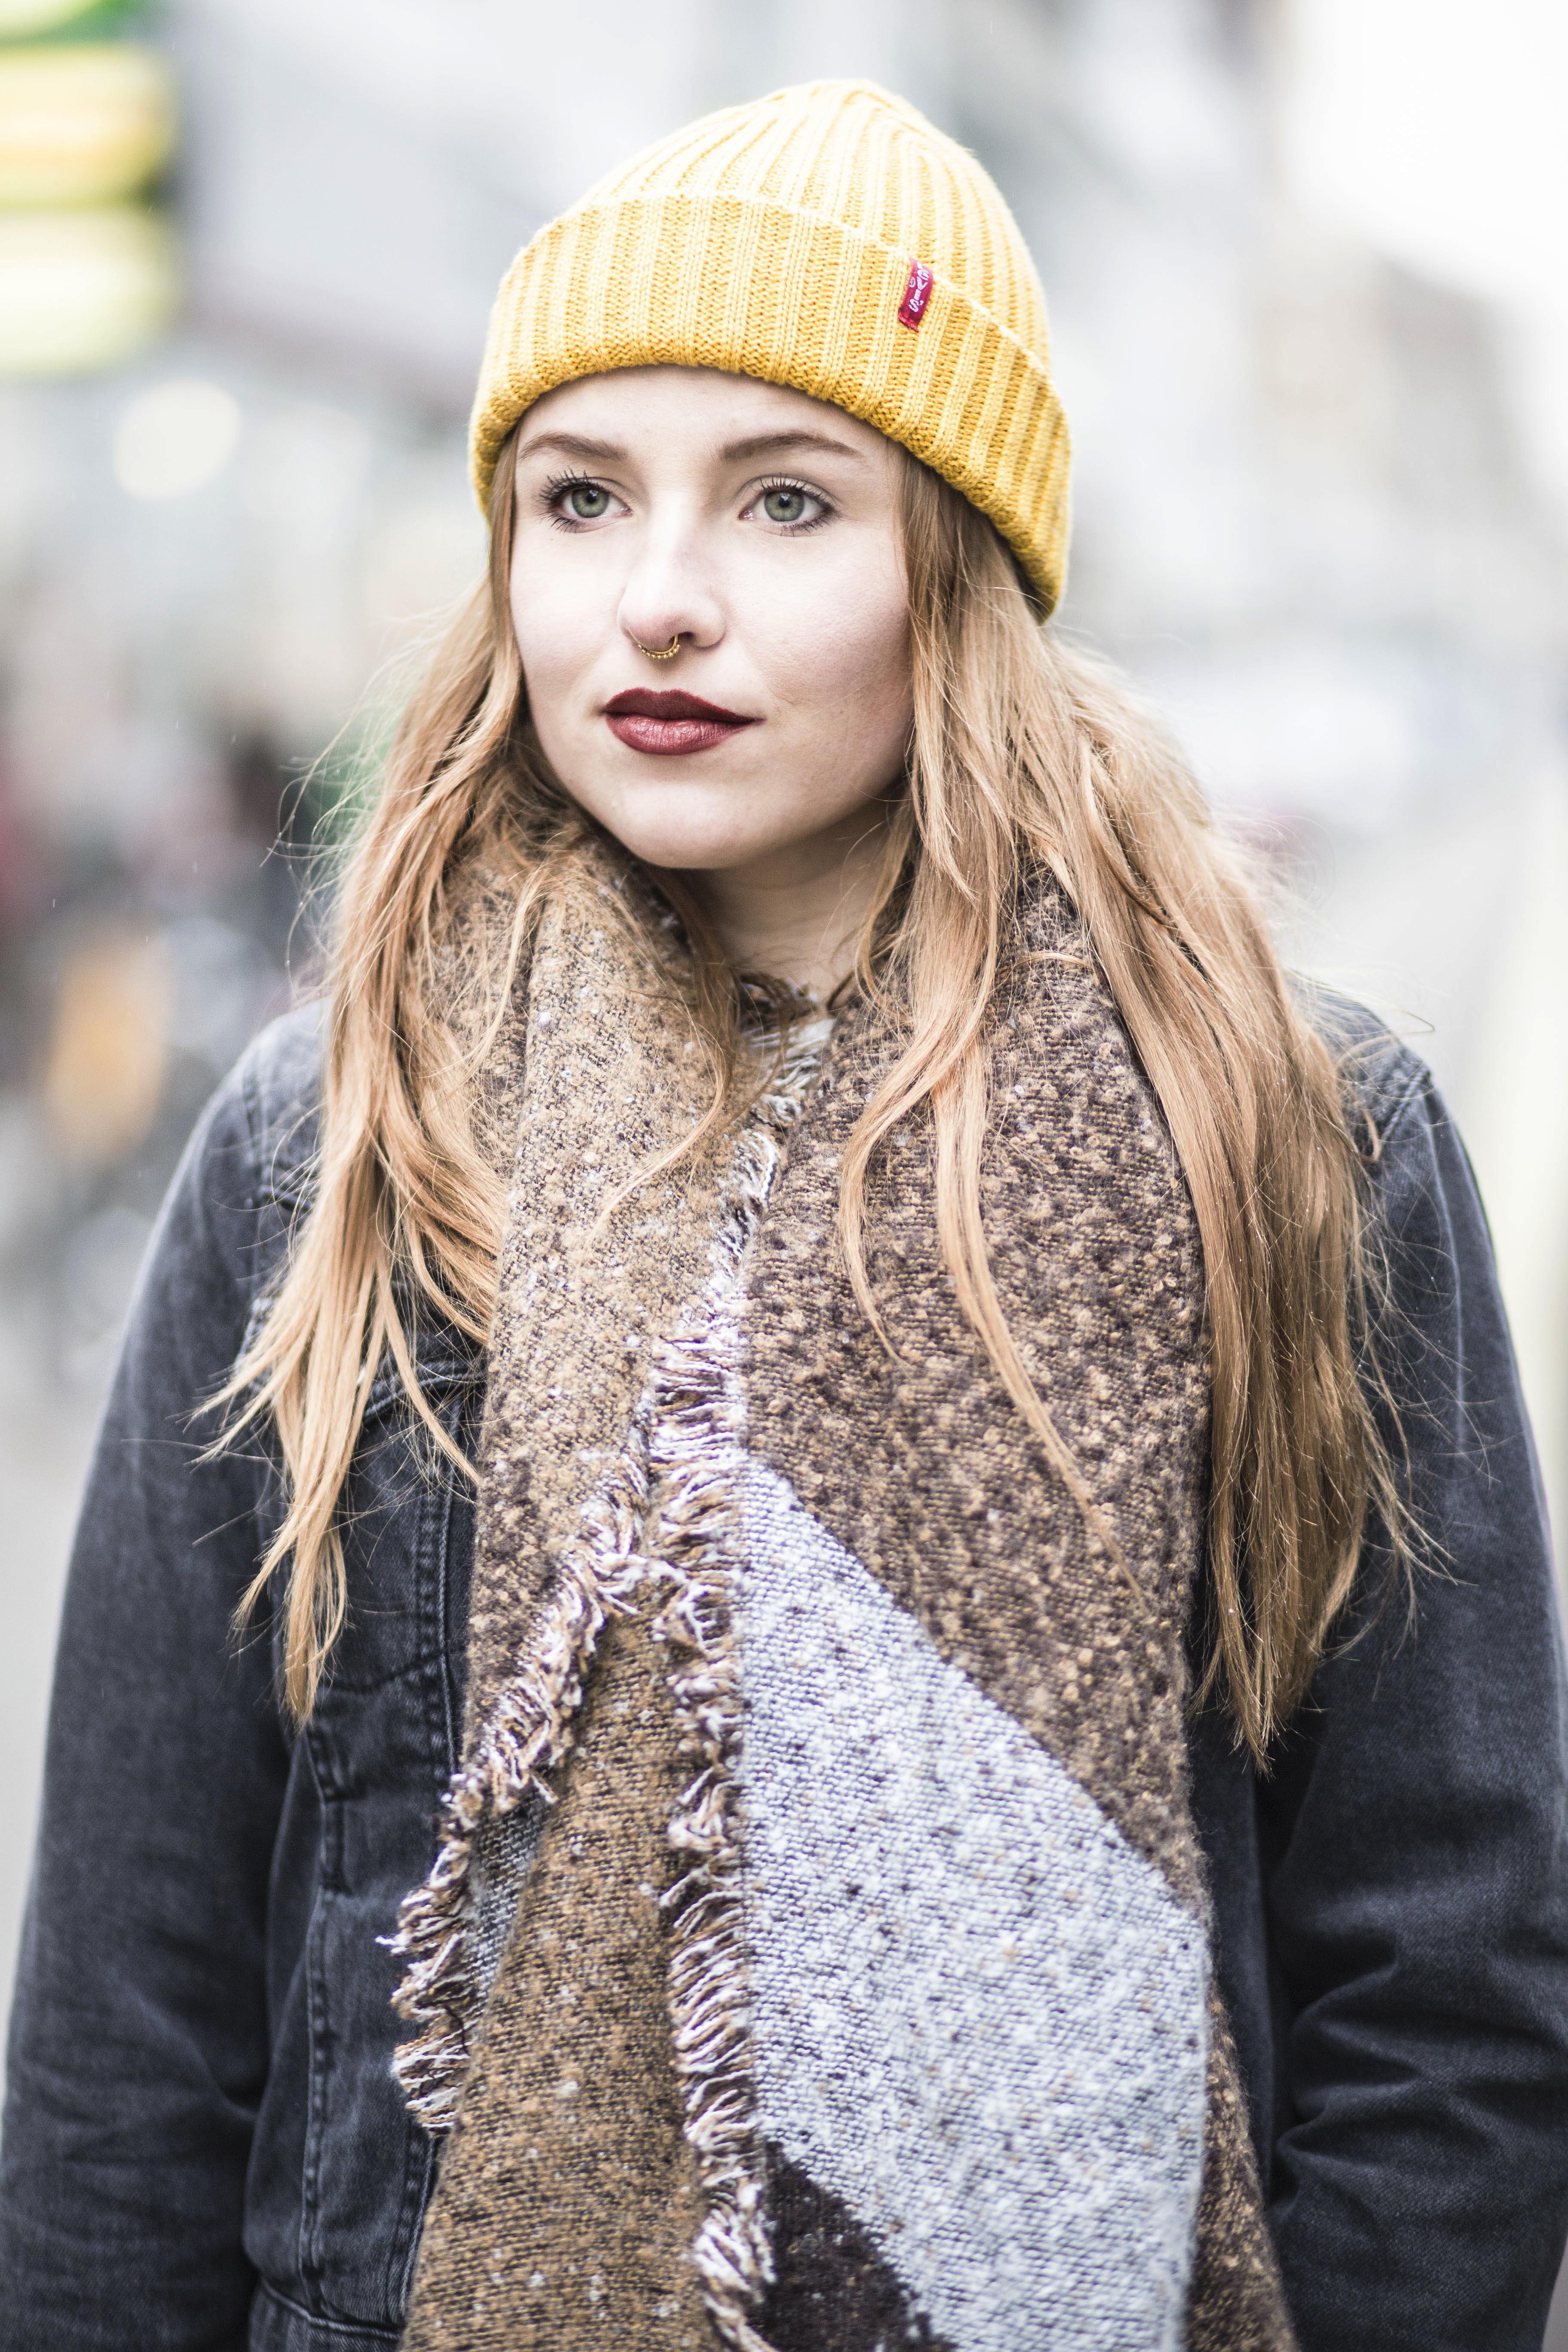 sassy-classy-scarf_11